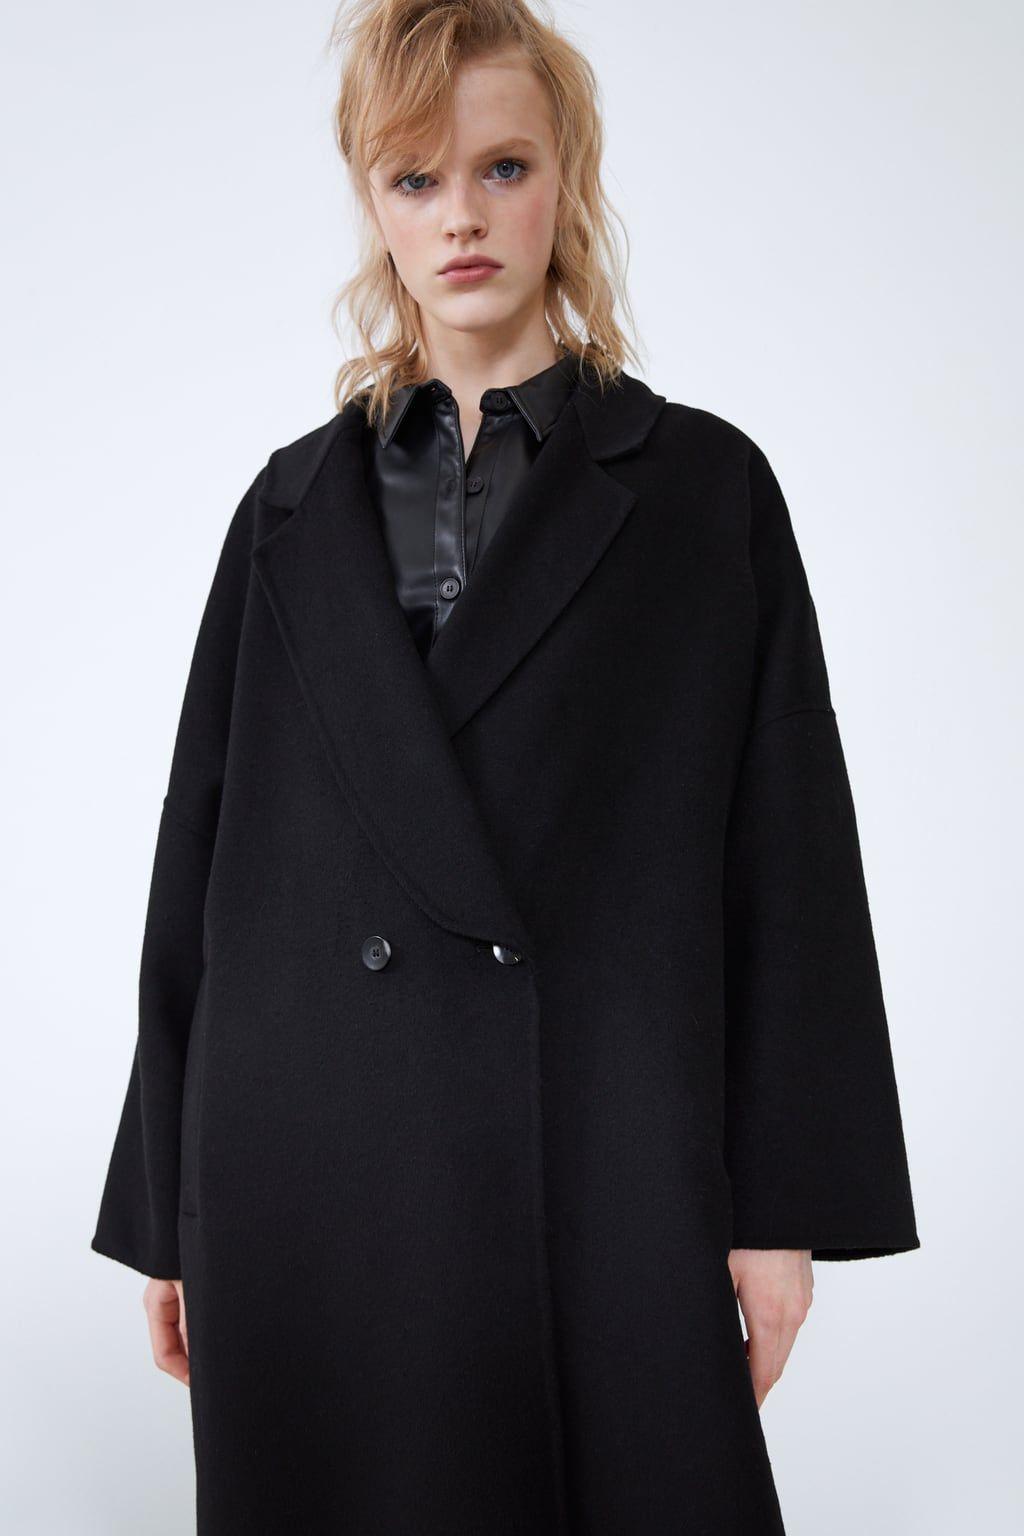 Long Oversized Coat Black Coats Coats Woman Zara United States Oversized Coat Coat Coats For Women [ 1536 x 1024 Pixel ]